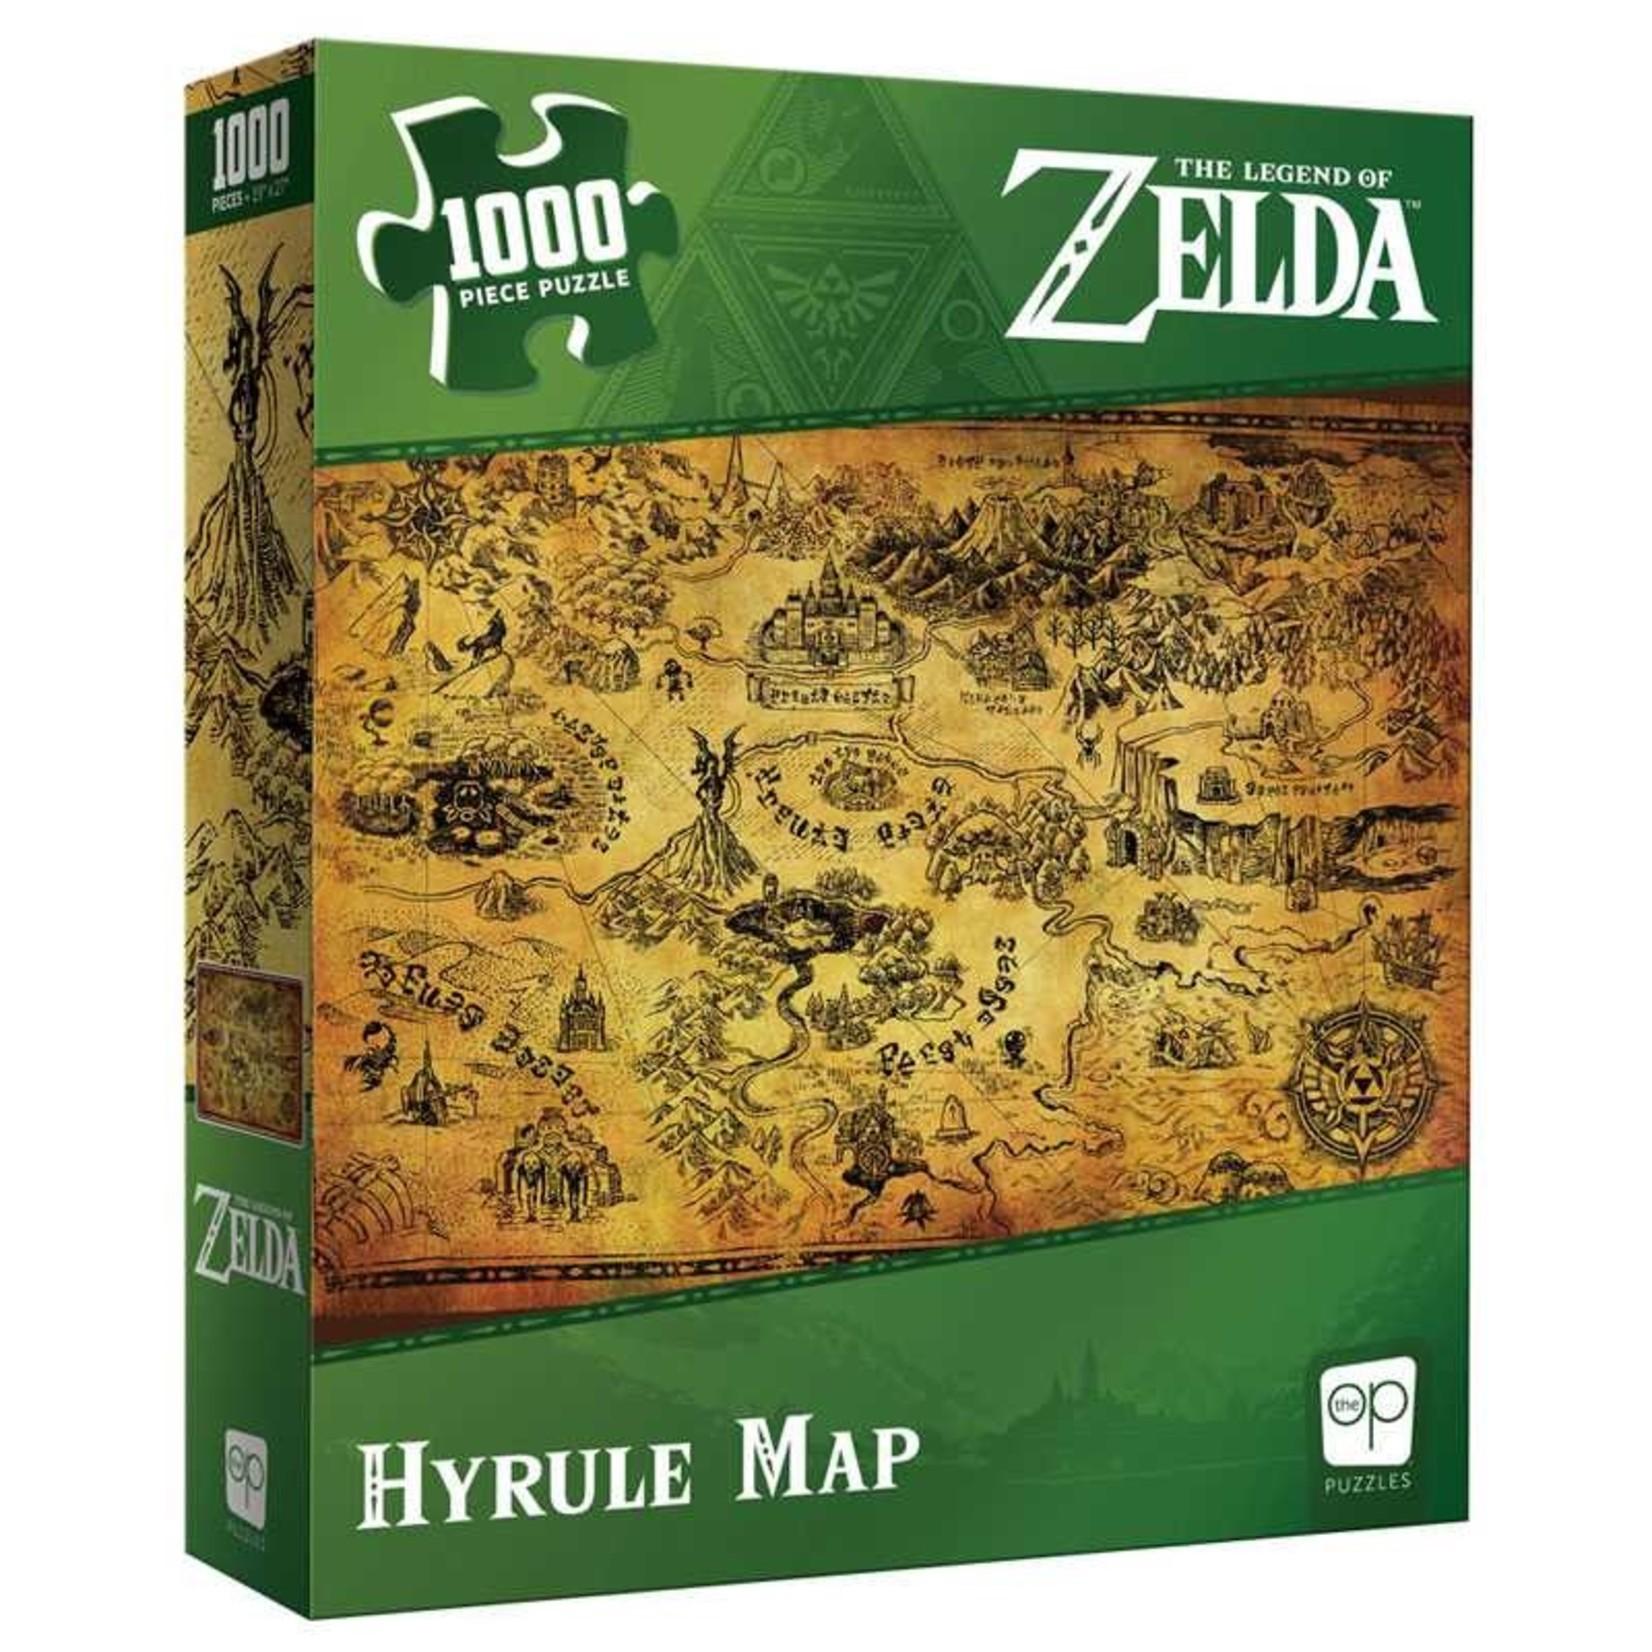 USAopoly USAPZ Zelda Hyrule Map (Puzzle1000)